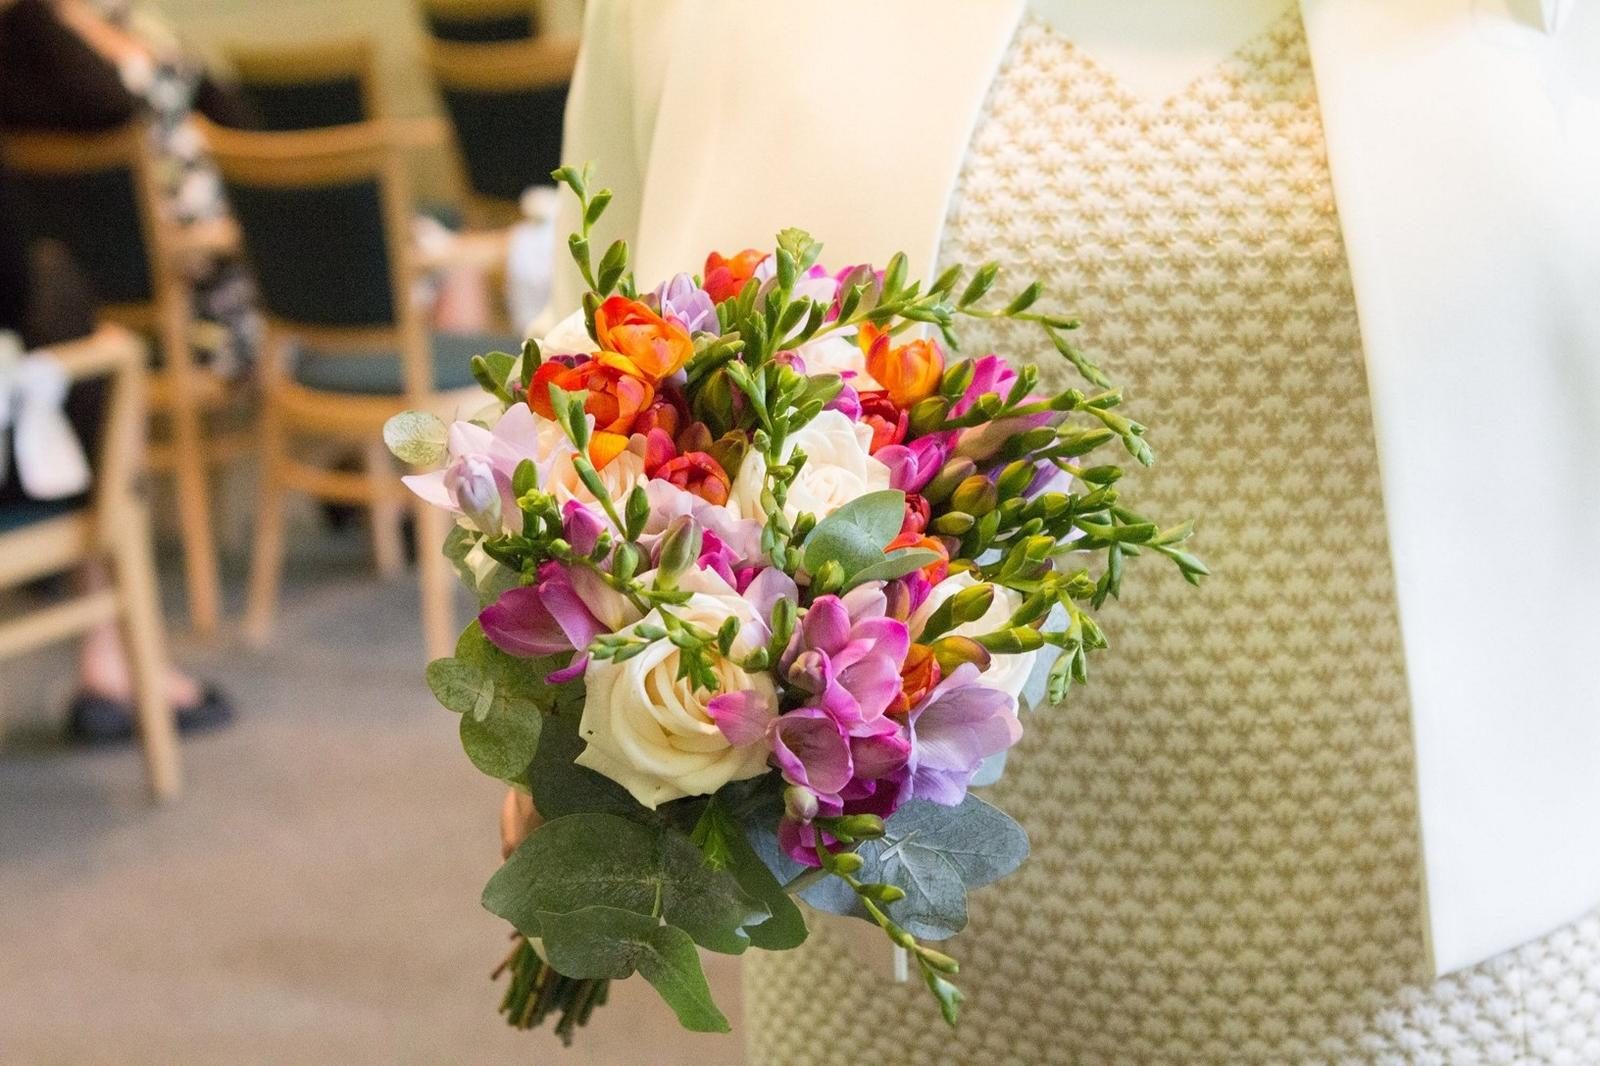 Gabriela Turanská - aranžmány - frézie,ruže a eukalyptus